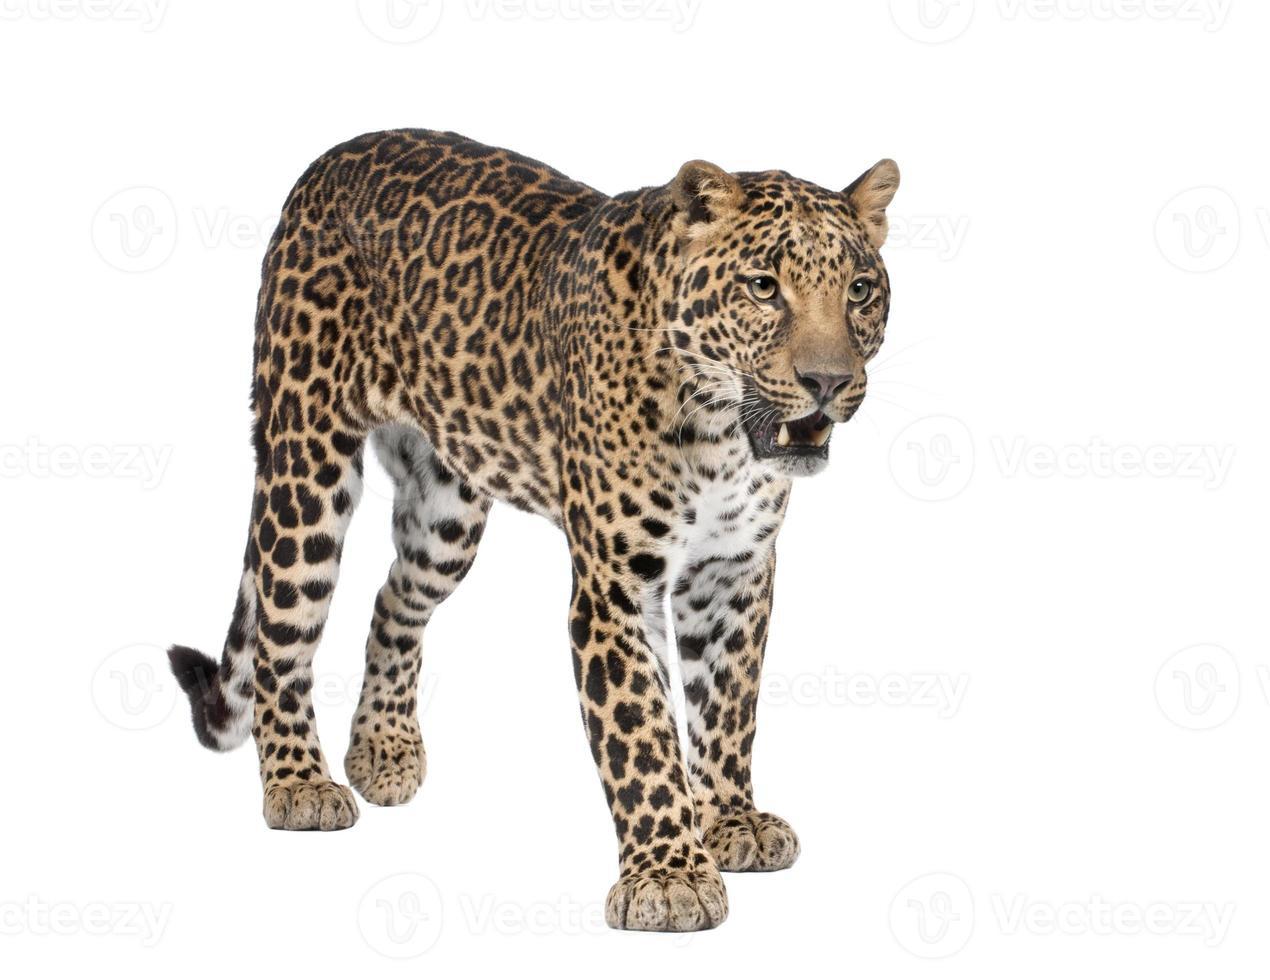 retrato de leopardo, panthera pardus, em pé, estúdio tiro foto